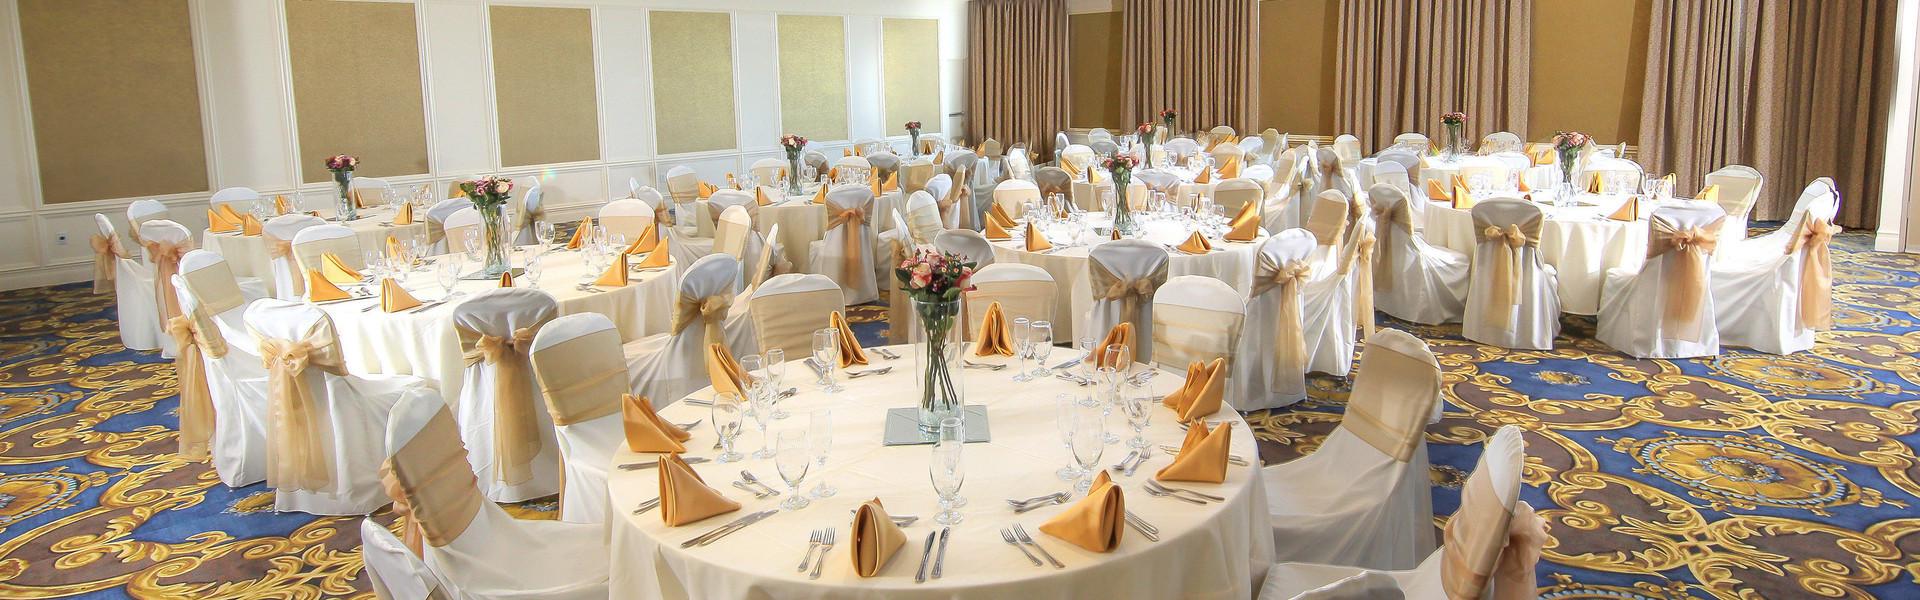 A Lakeside Reception Hall For Orlando Weddings - Orlando Wedding Reception